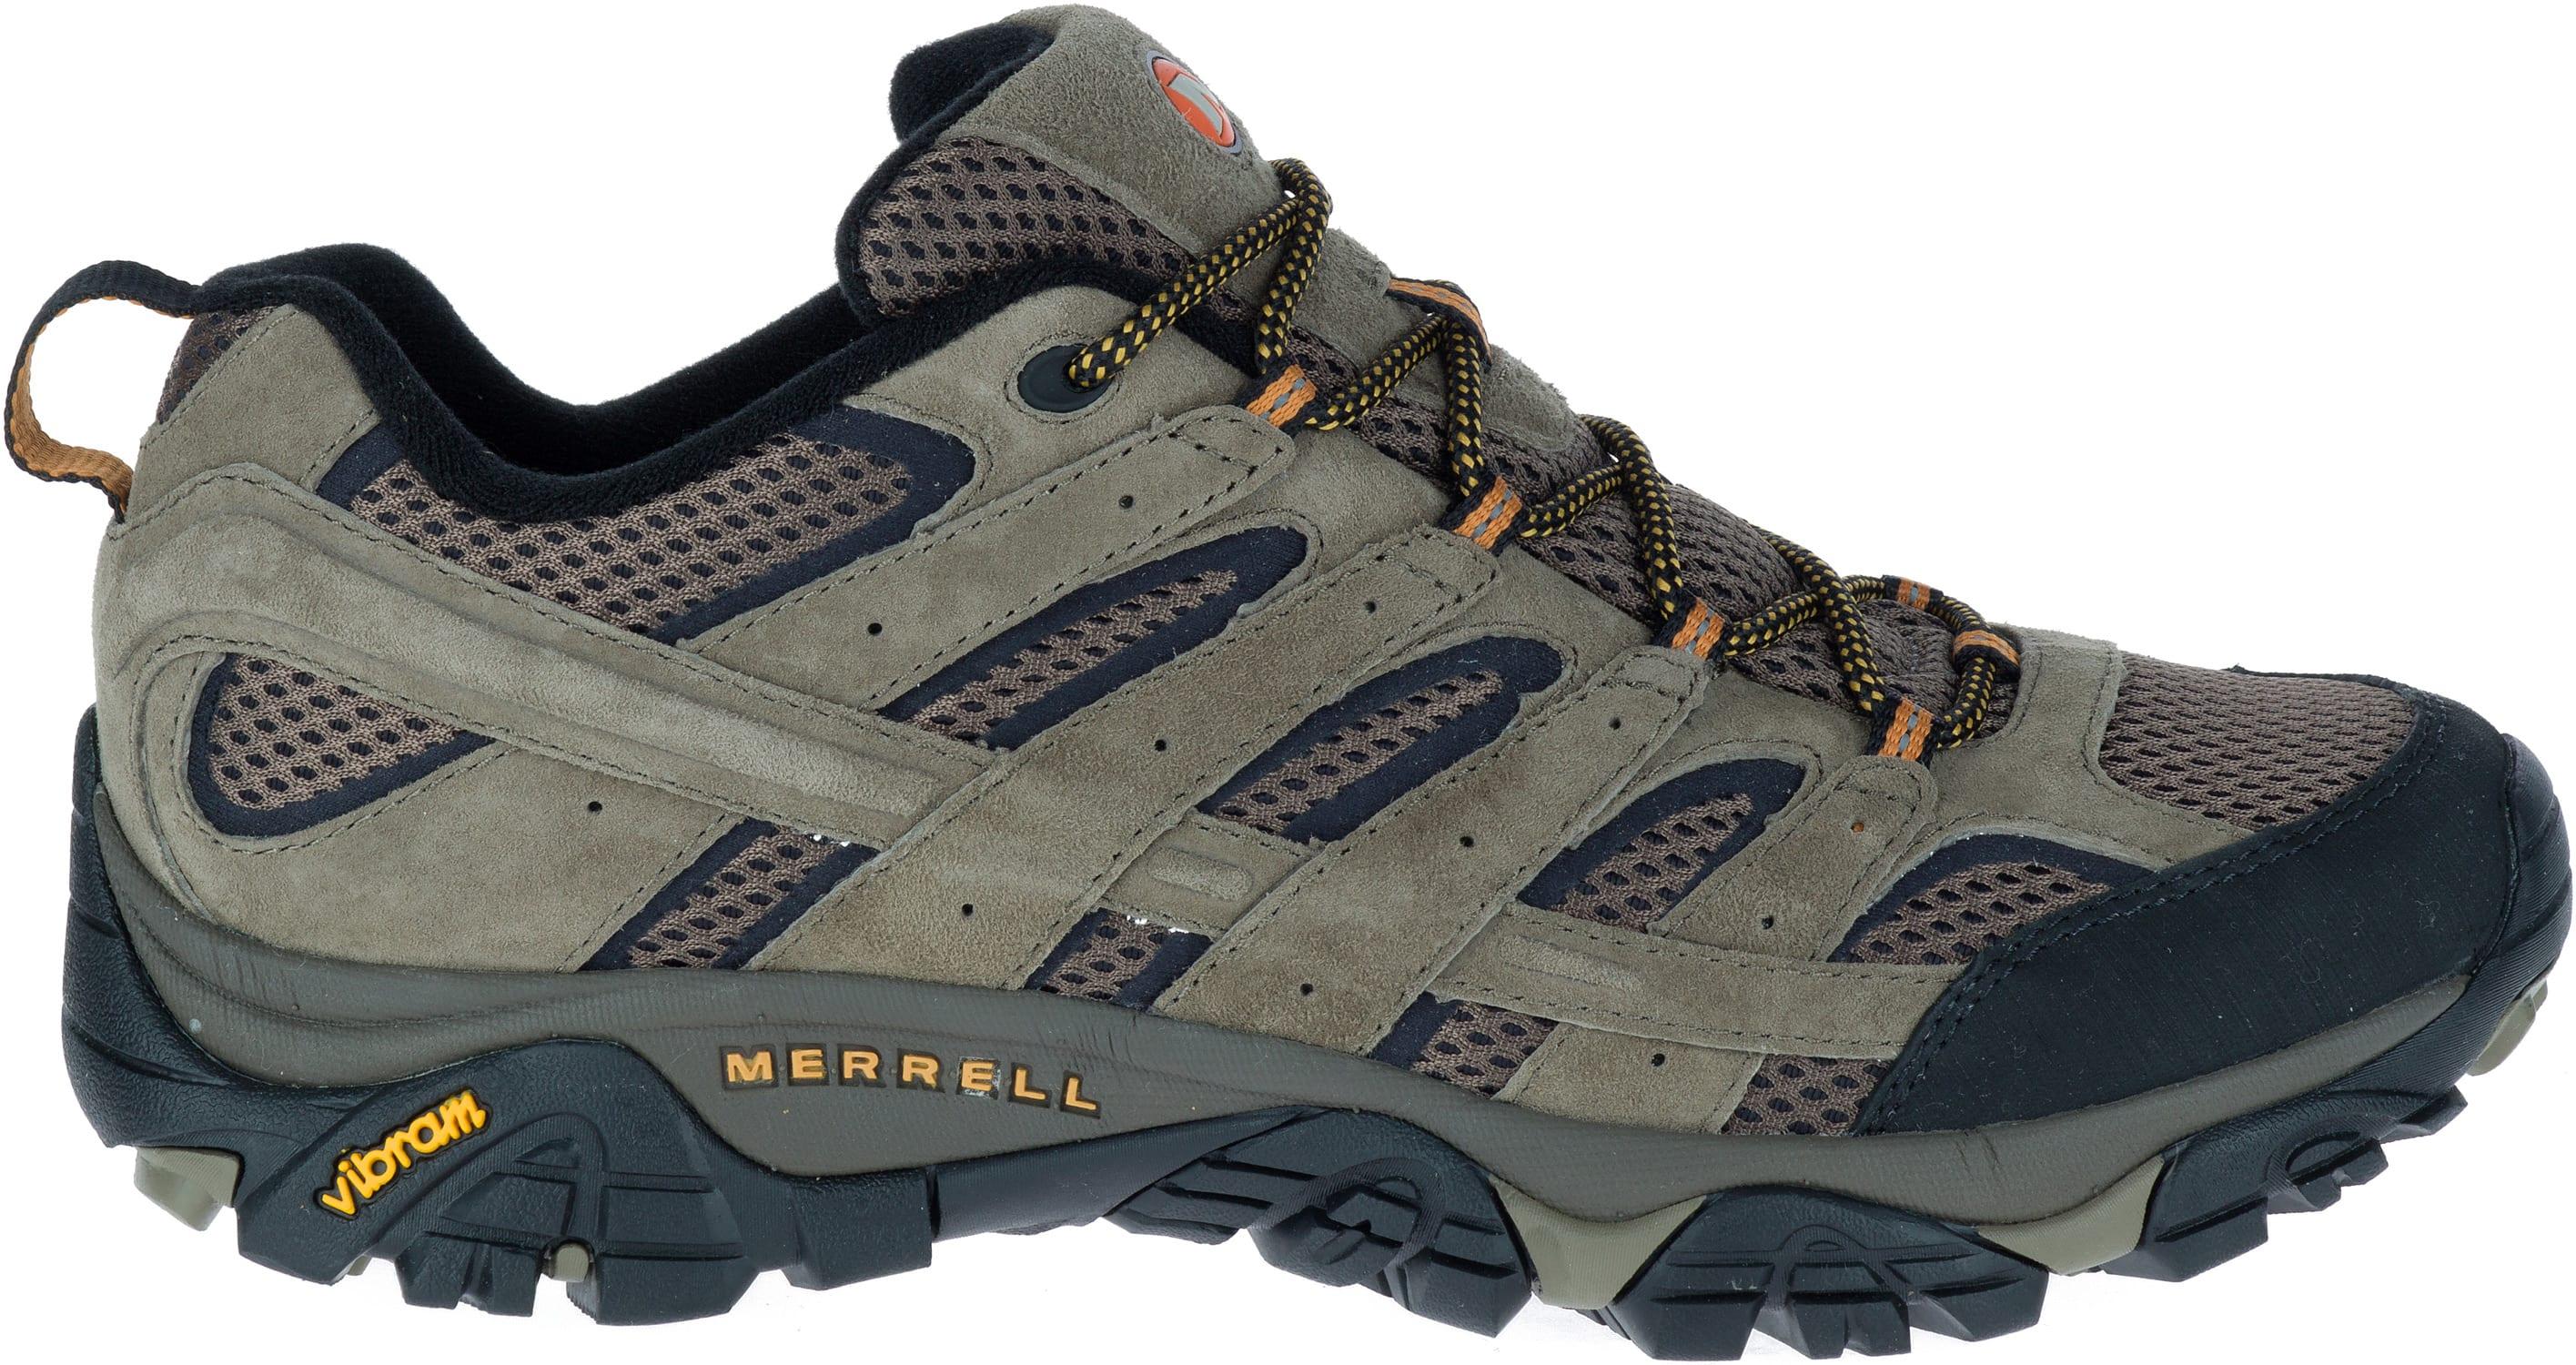 Hiking Shoes Black Friday